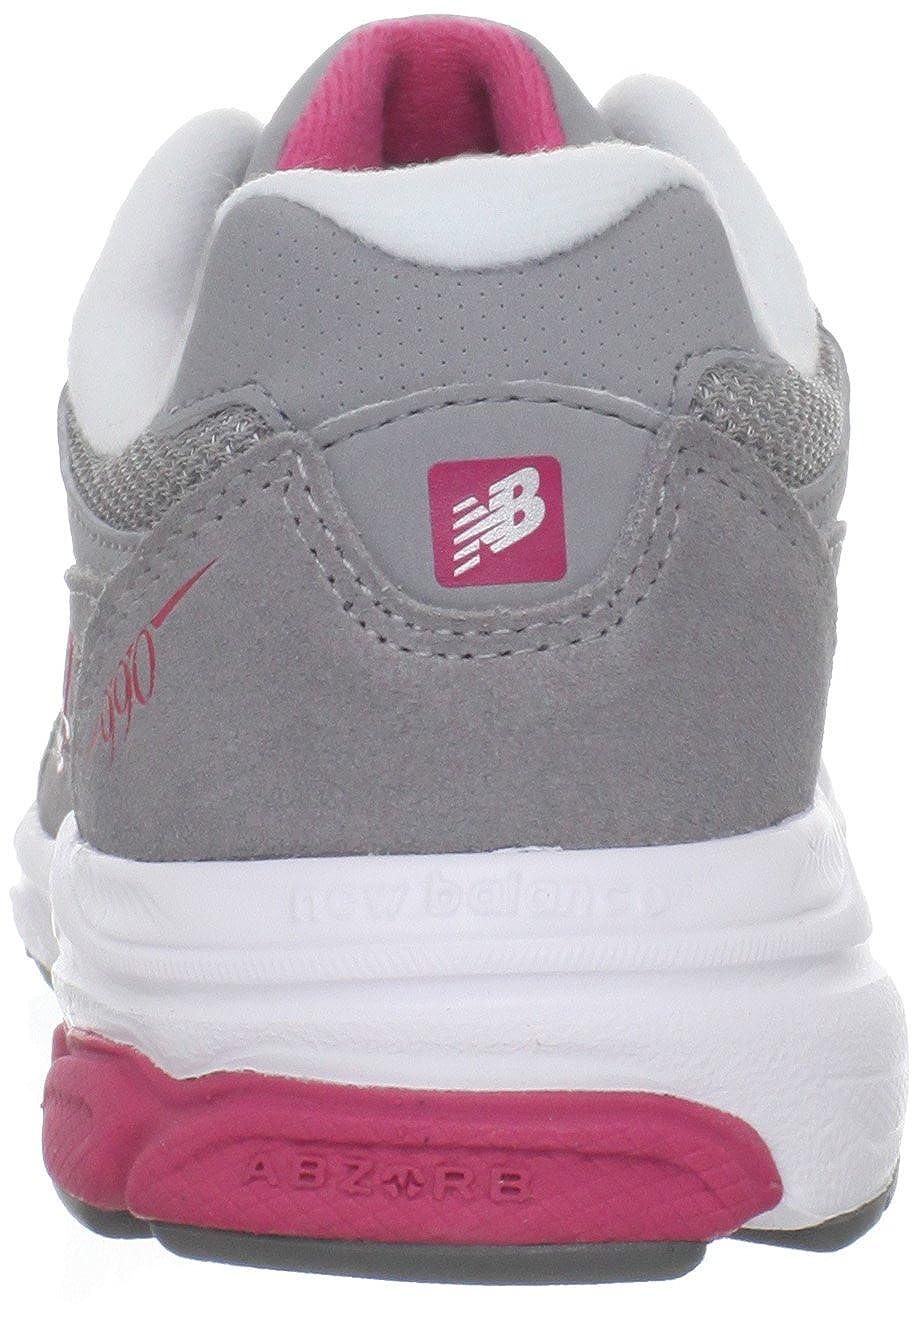 New Balance KJ990 Lace-Up Running schuhe (Toddler Little Kid Kid Kid Big Kid) 41cc6e